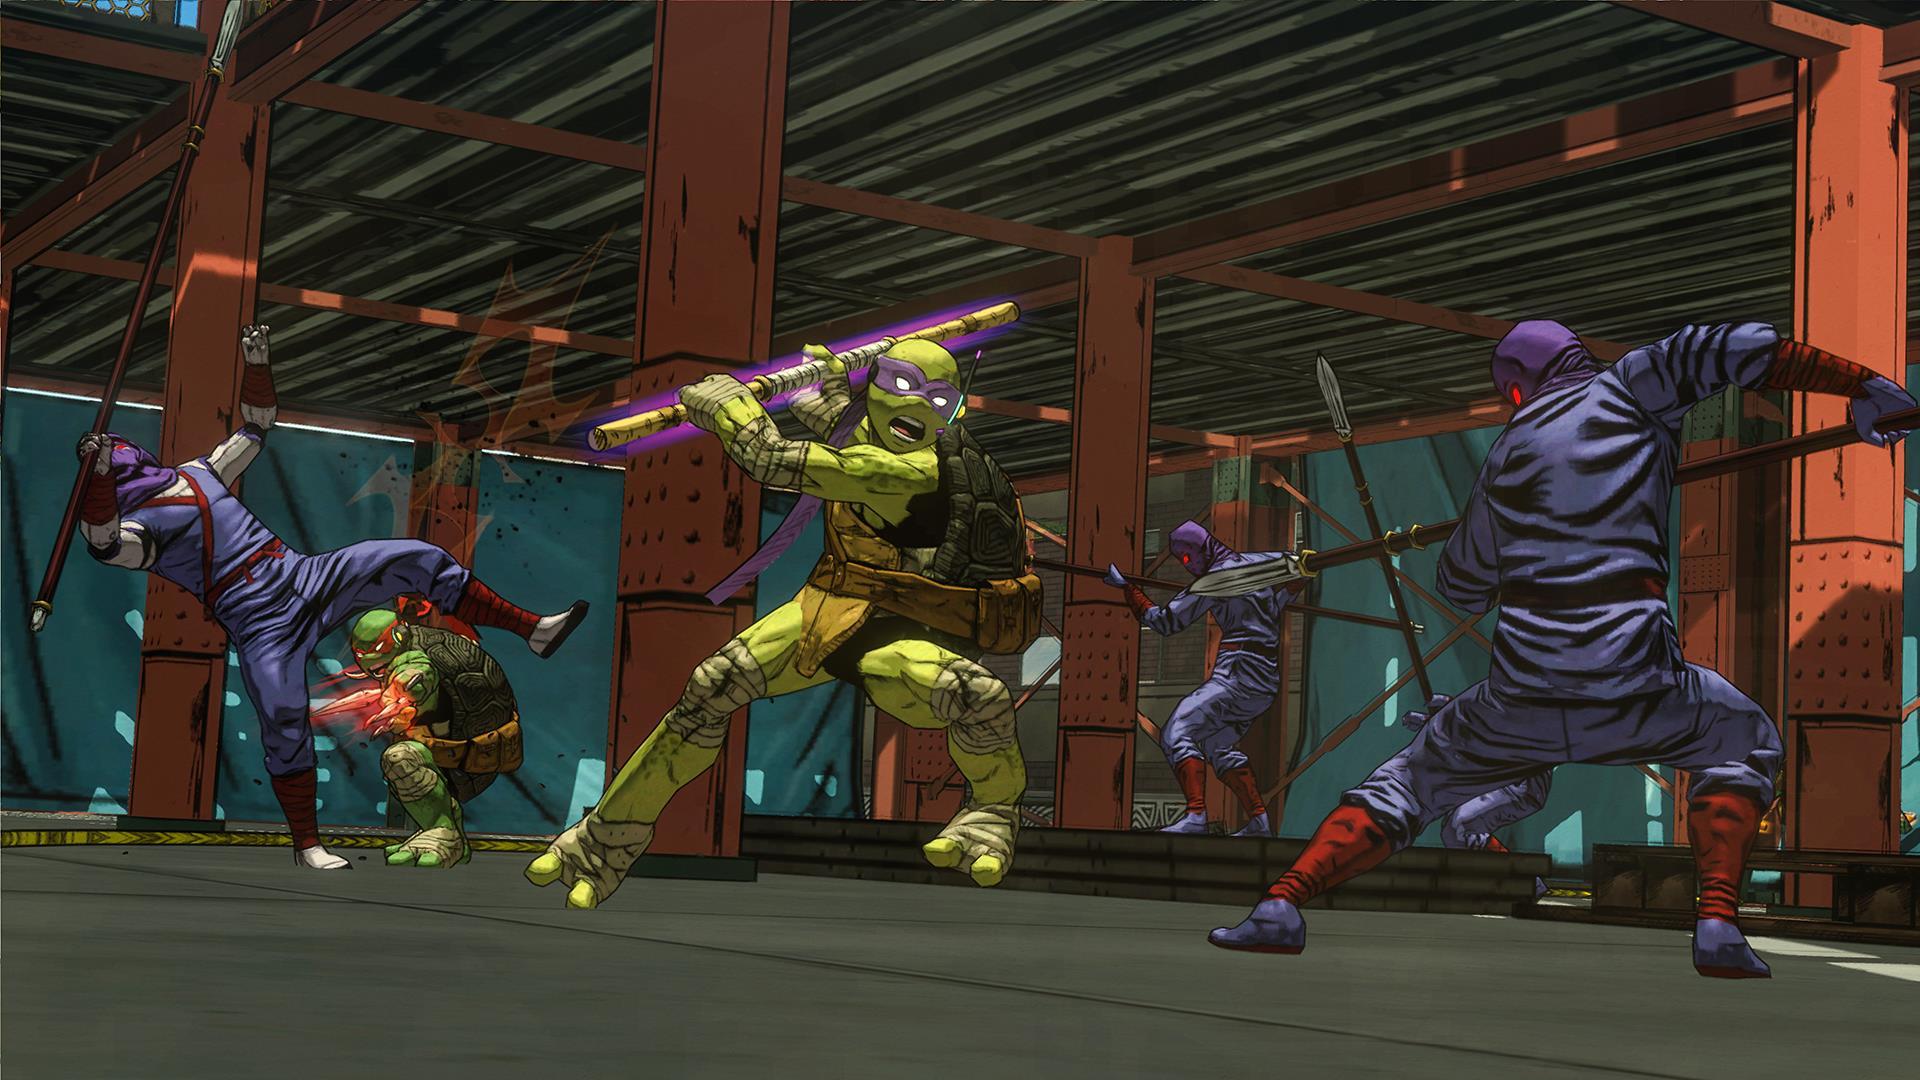 teenage-mutant-ninja-turtles-mutants-in-manhattan-6